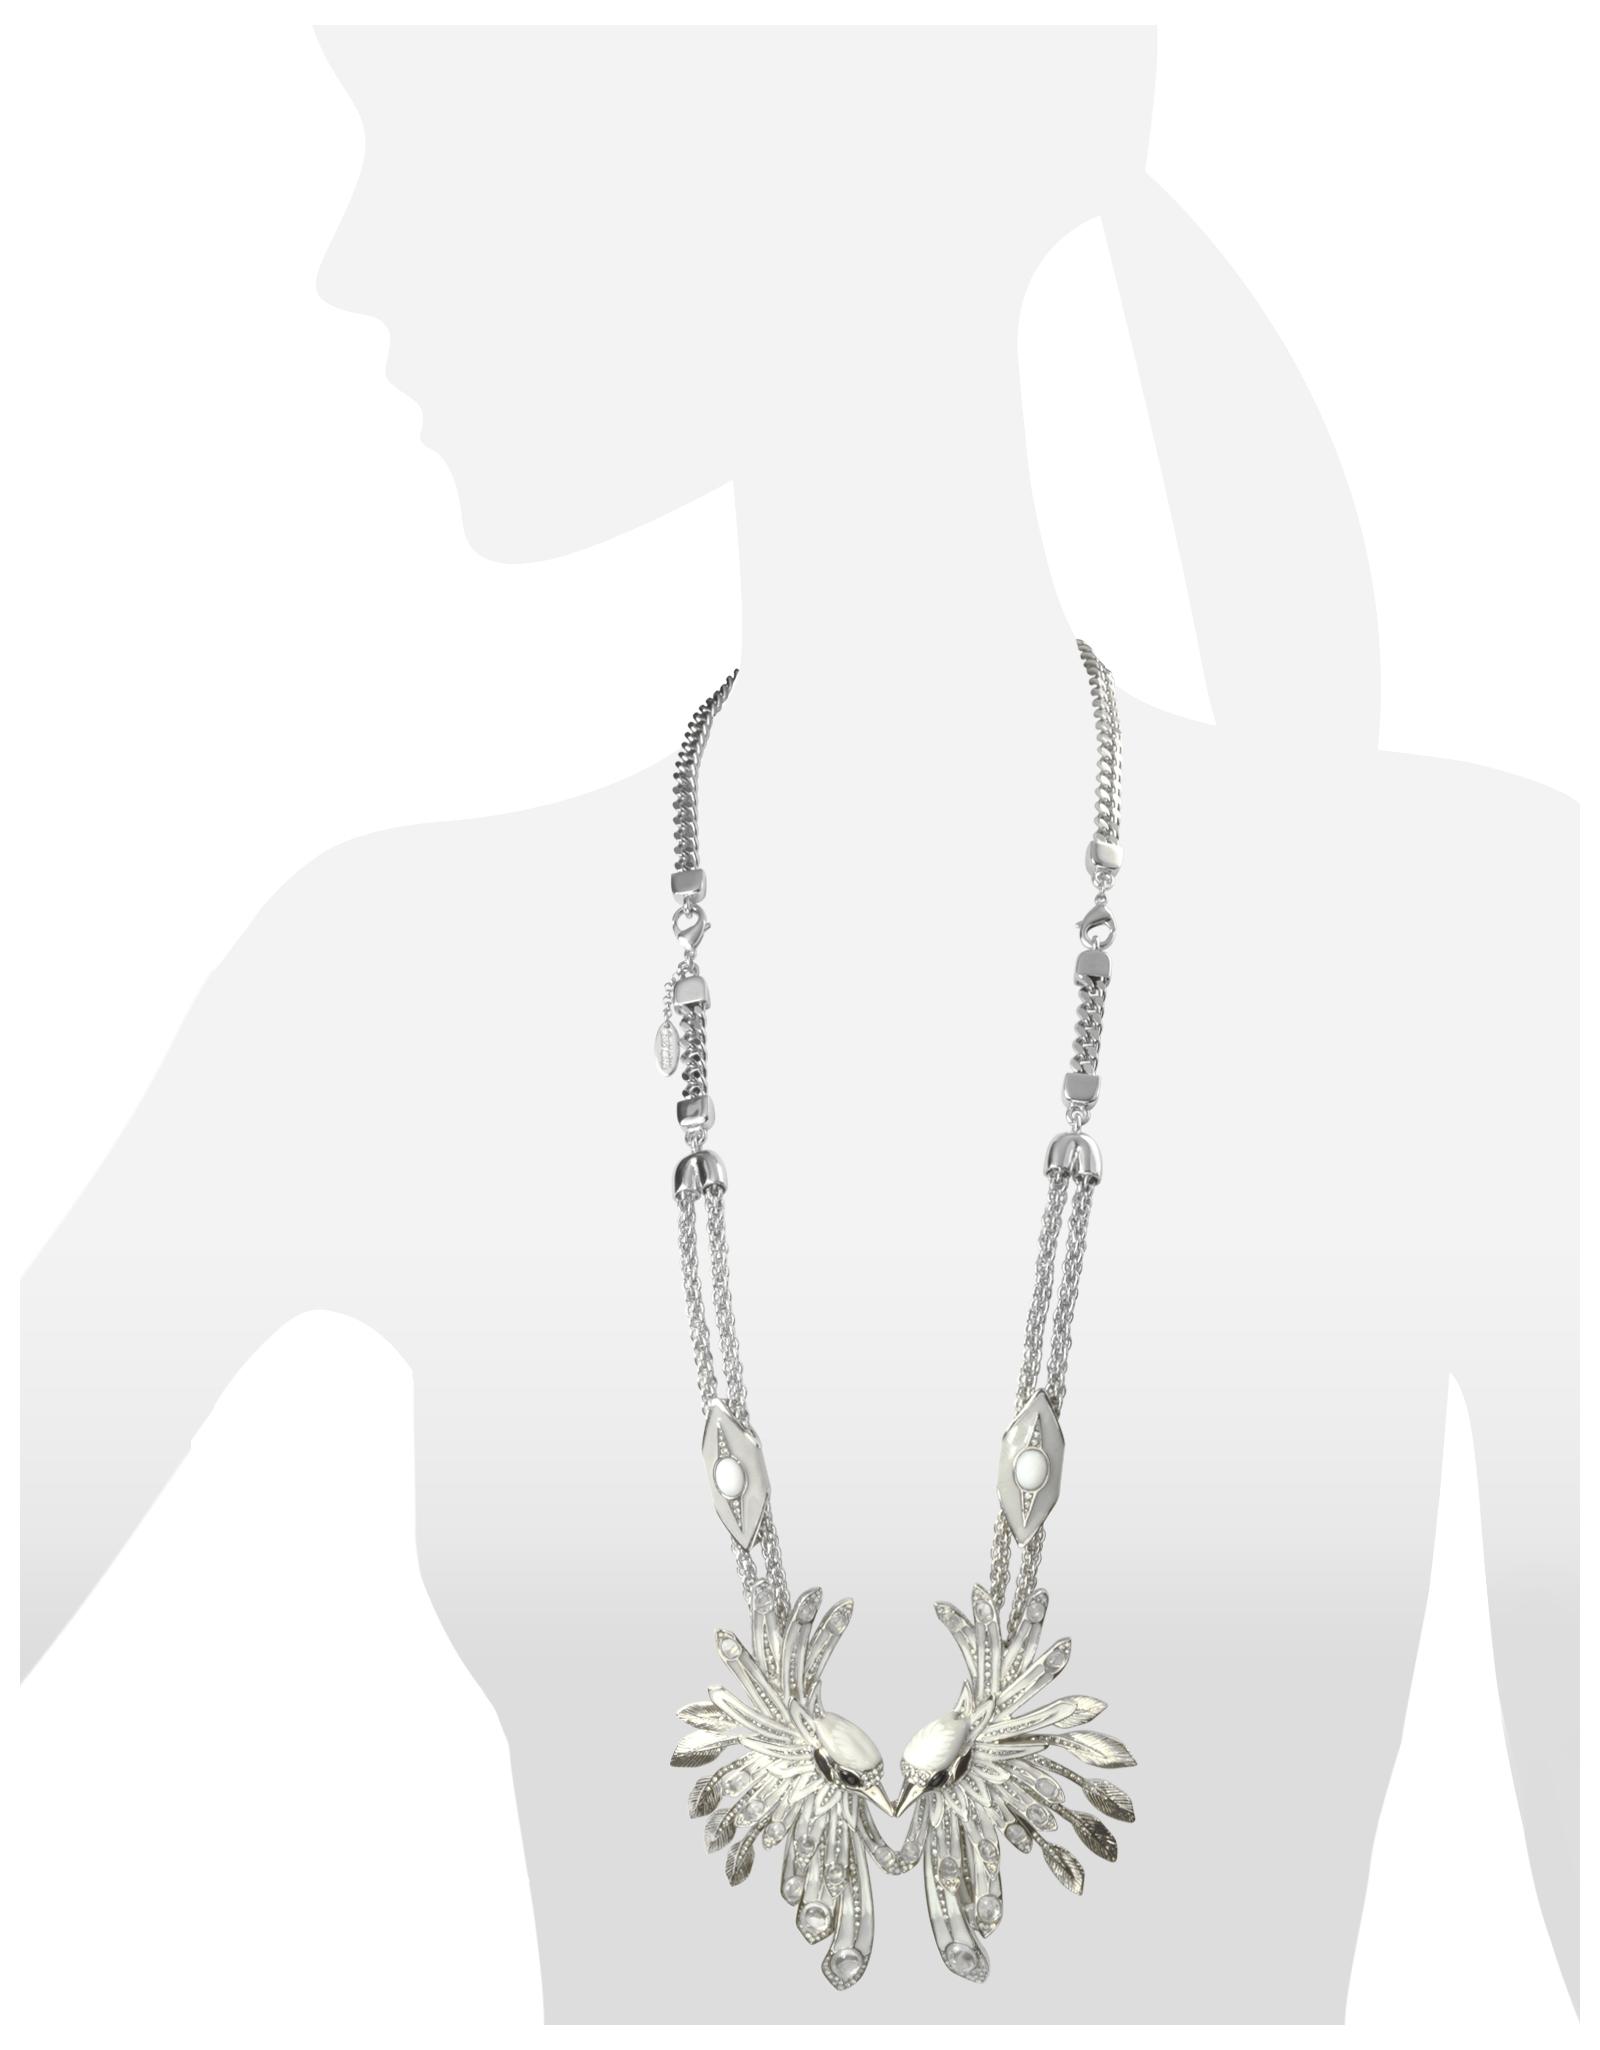 Roberto Cavalli Aella Necklace in Silver InODw